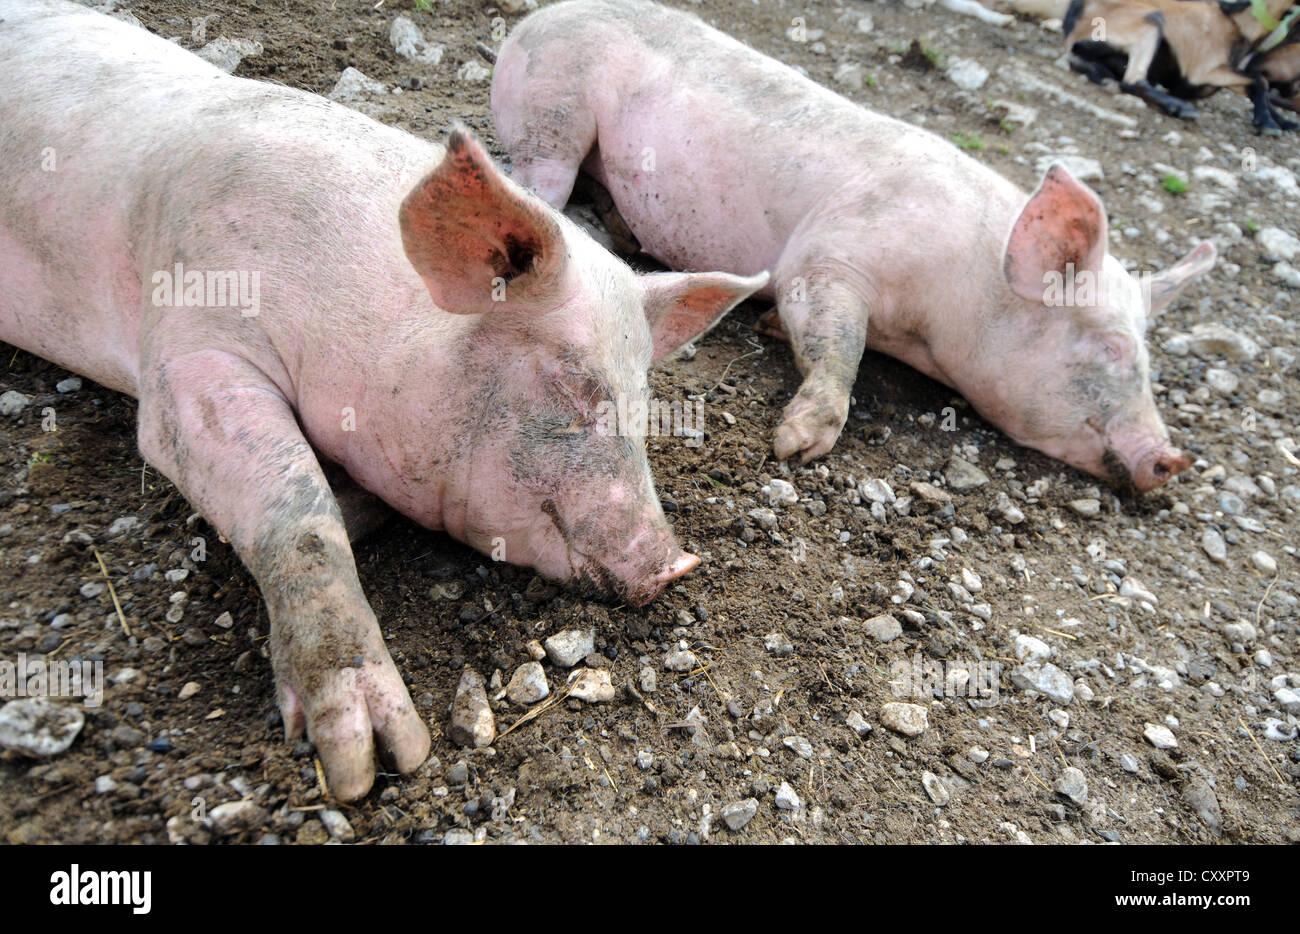 Pigs, sleeping pig, pigs asleep - Stock Image